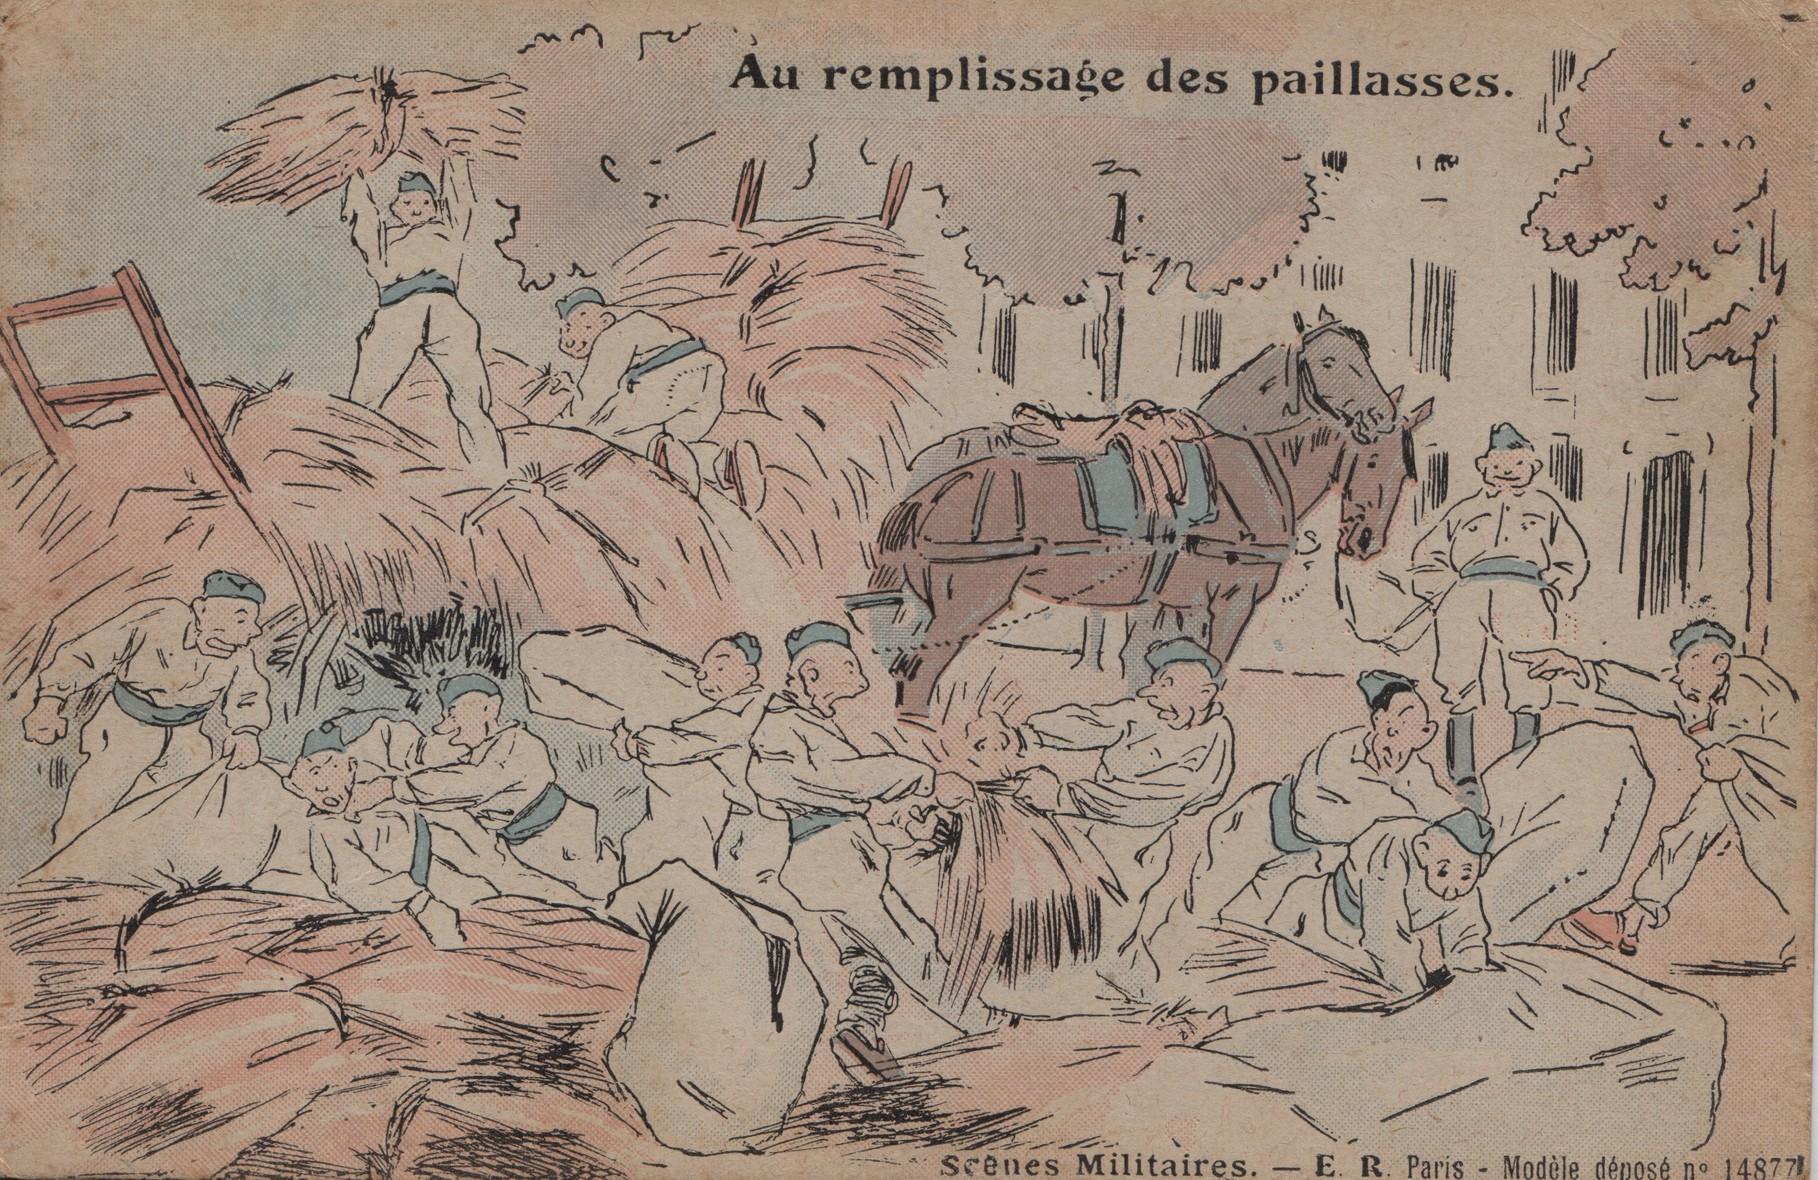 4. Langres 5th September 1916